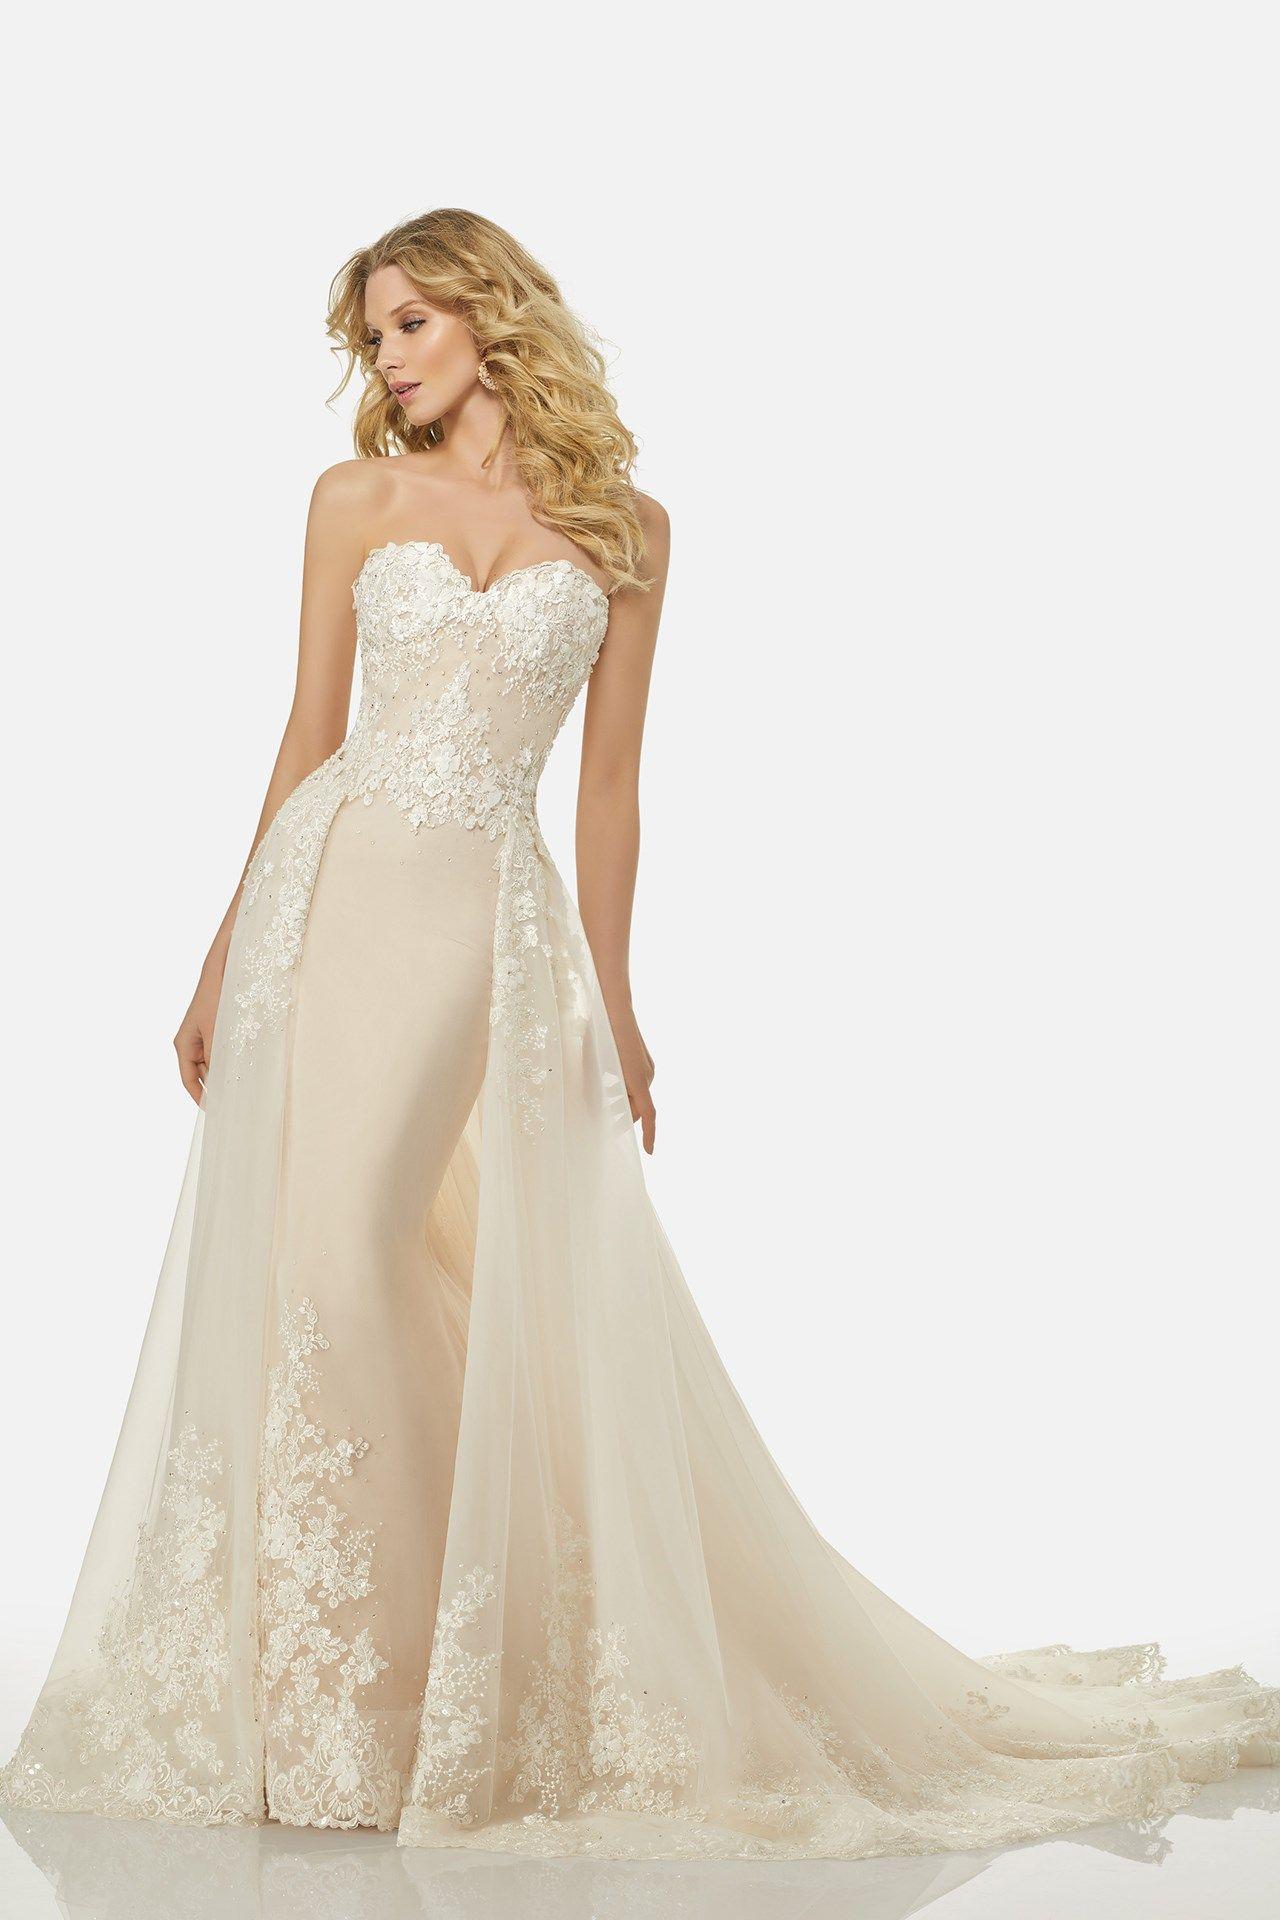 Randy from SYTTD Wedding dresses, Wedding dresses